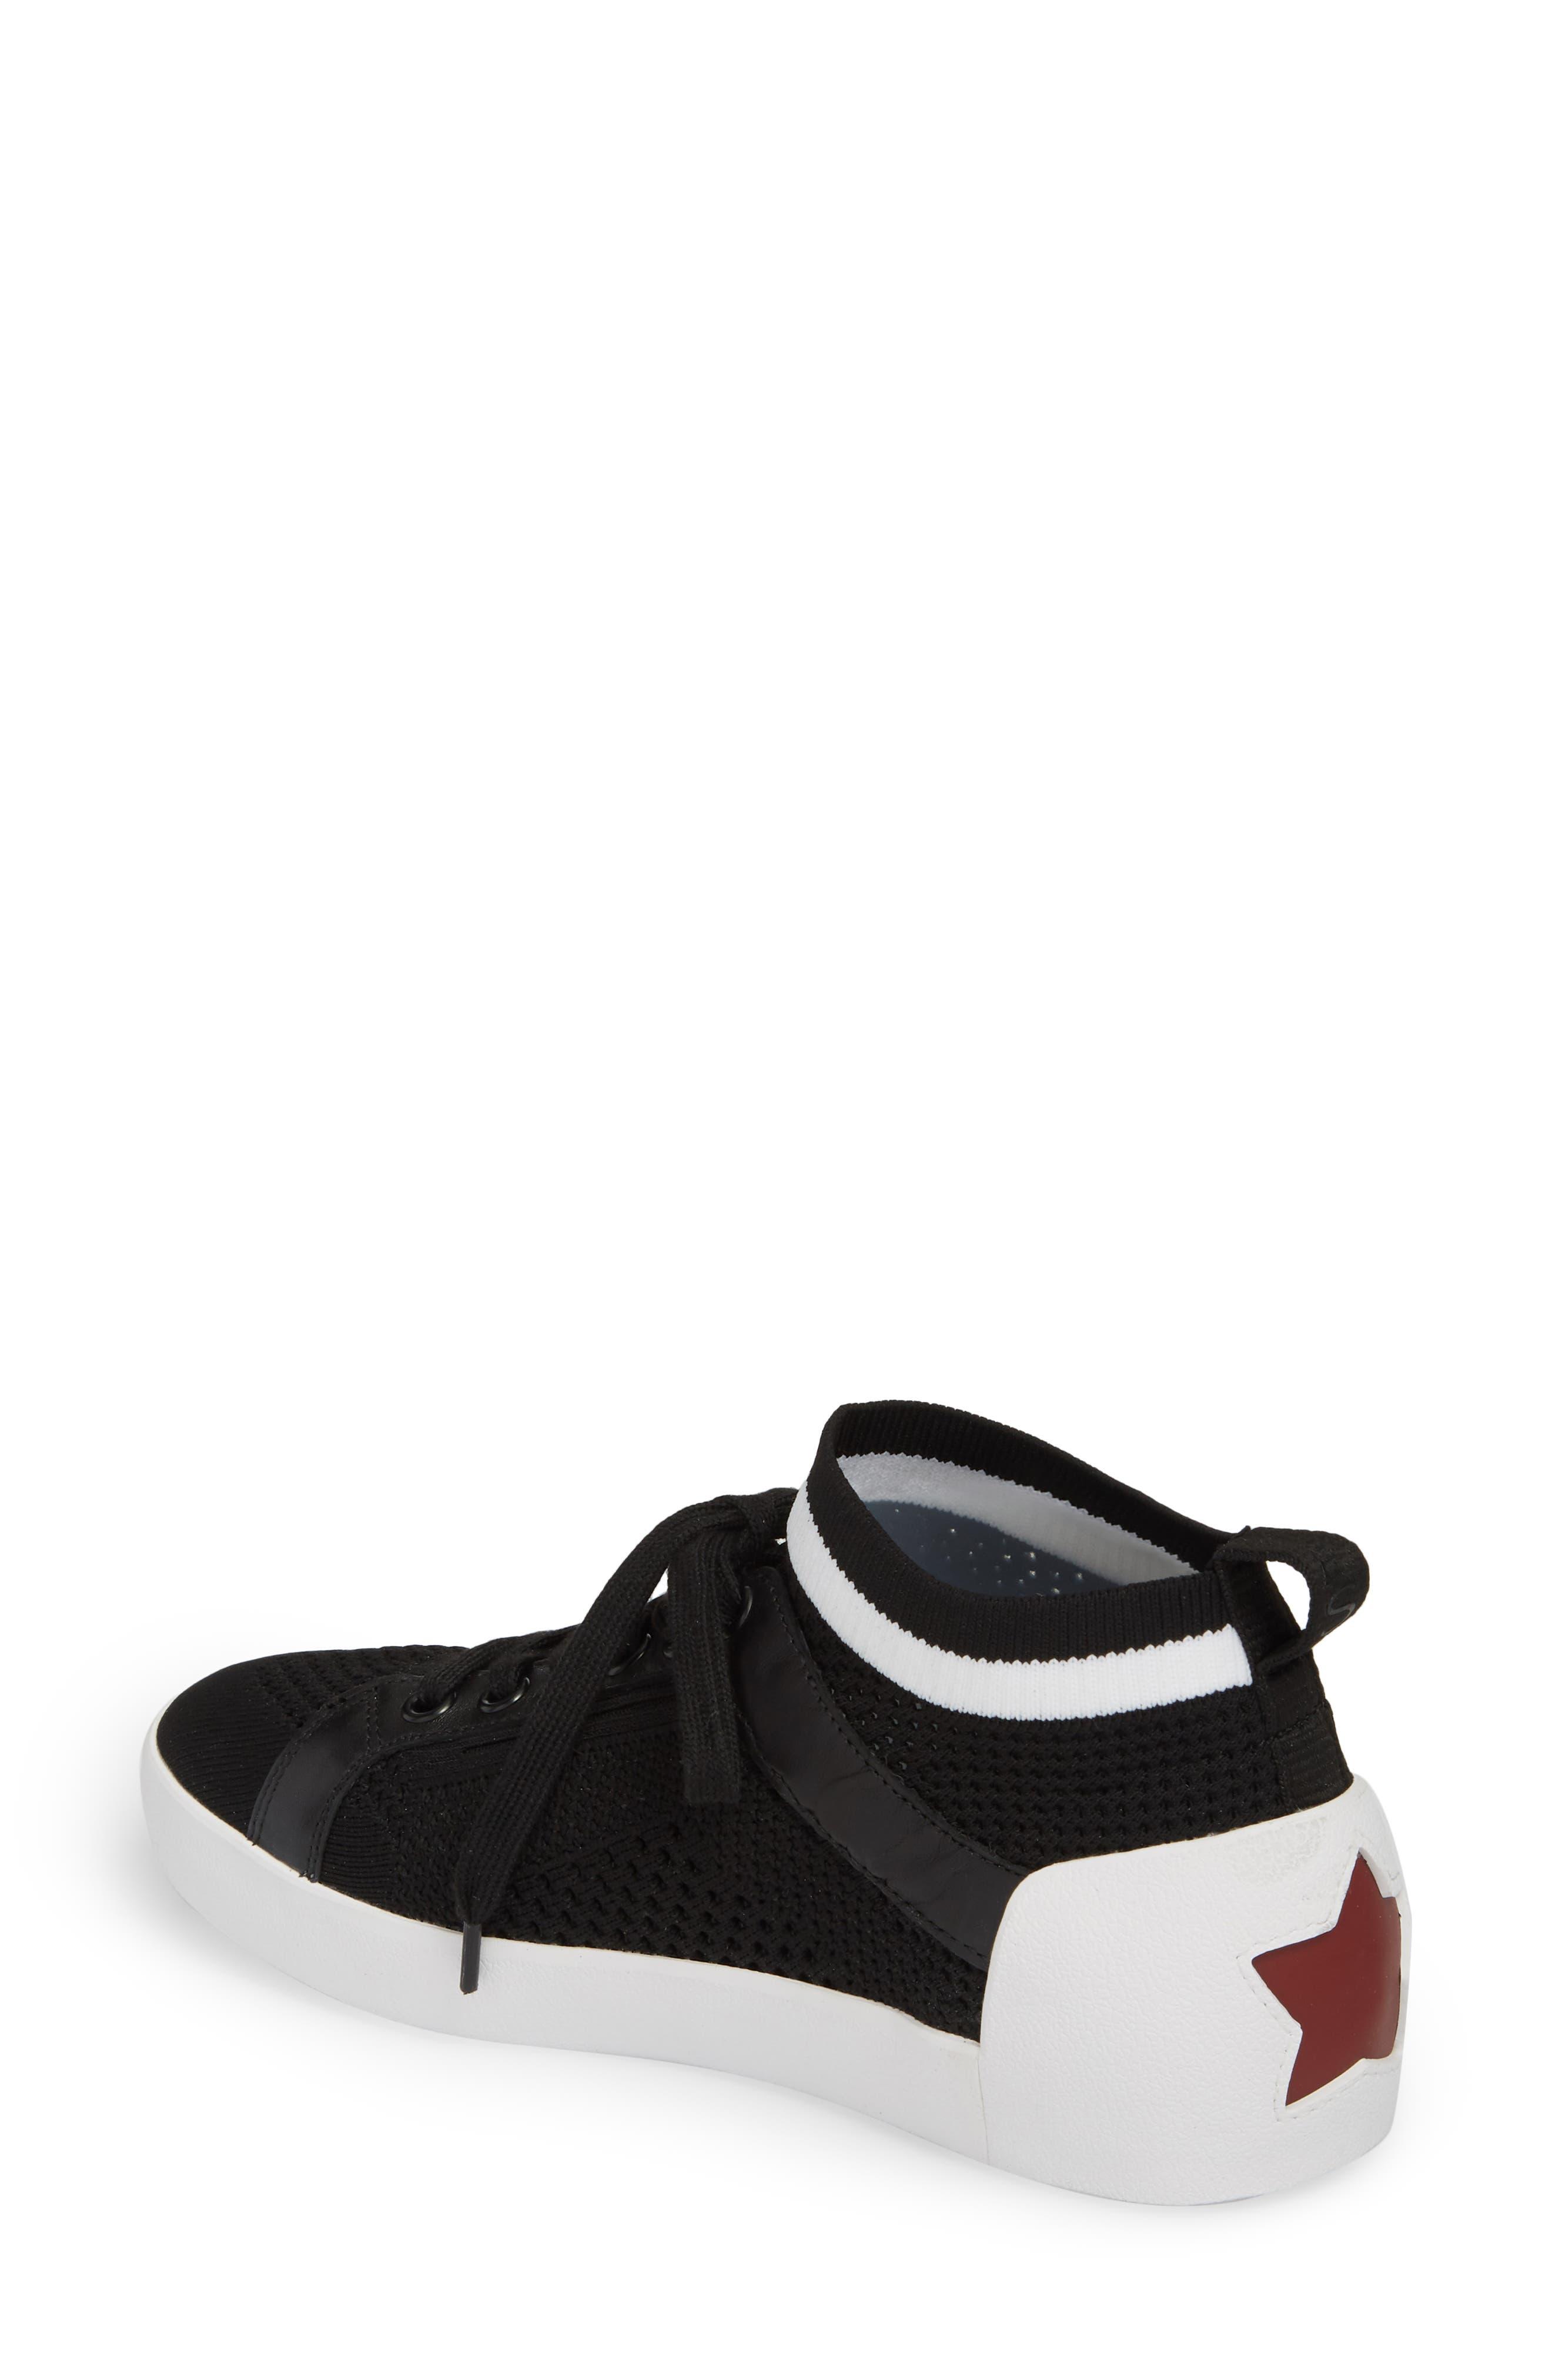 Nolita Mid Top Sock Sneaker,                             Alternate thumbnail 2, color,                             001